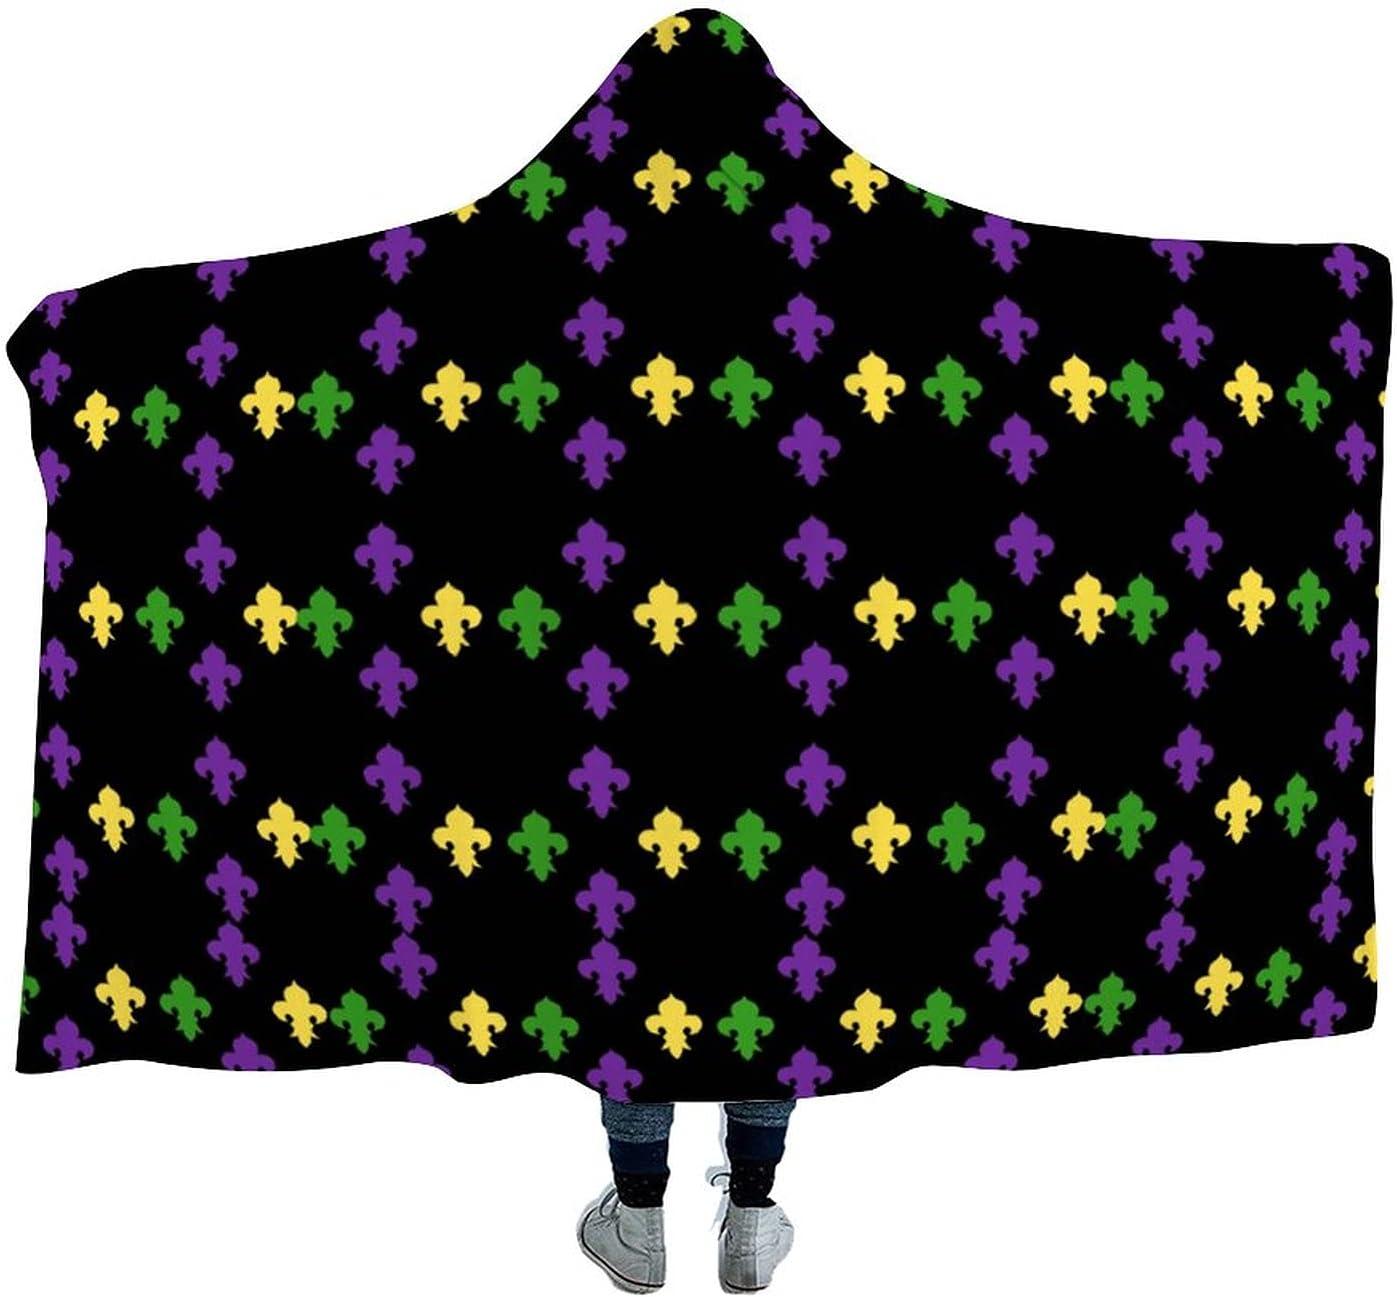 Mardi Gras Fleur De Surprise price Lis Wearable W for Cloak Hooded Blanket Soft Be super welcome